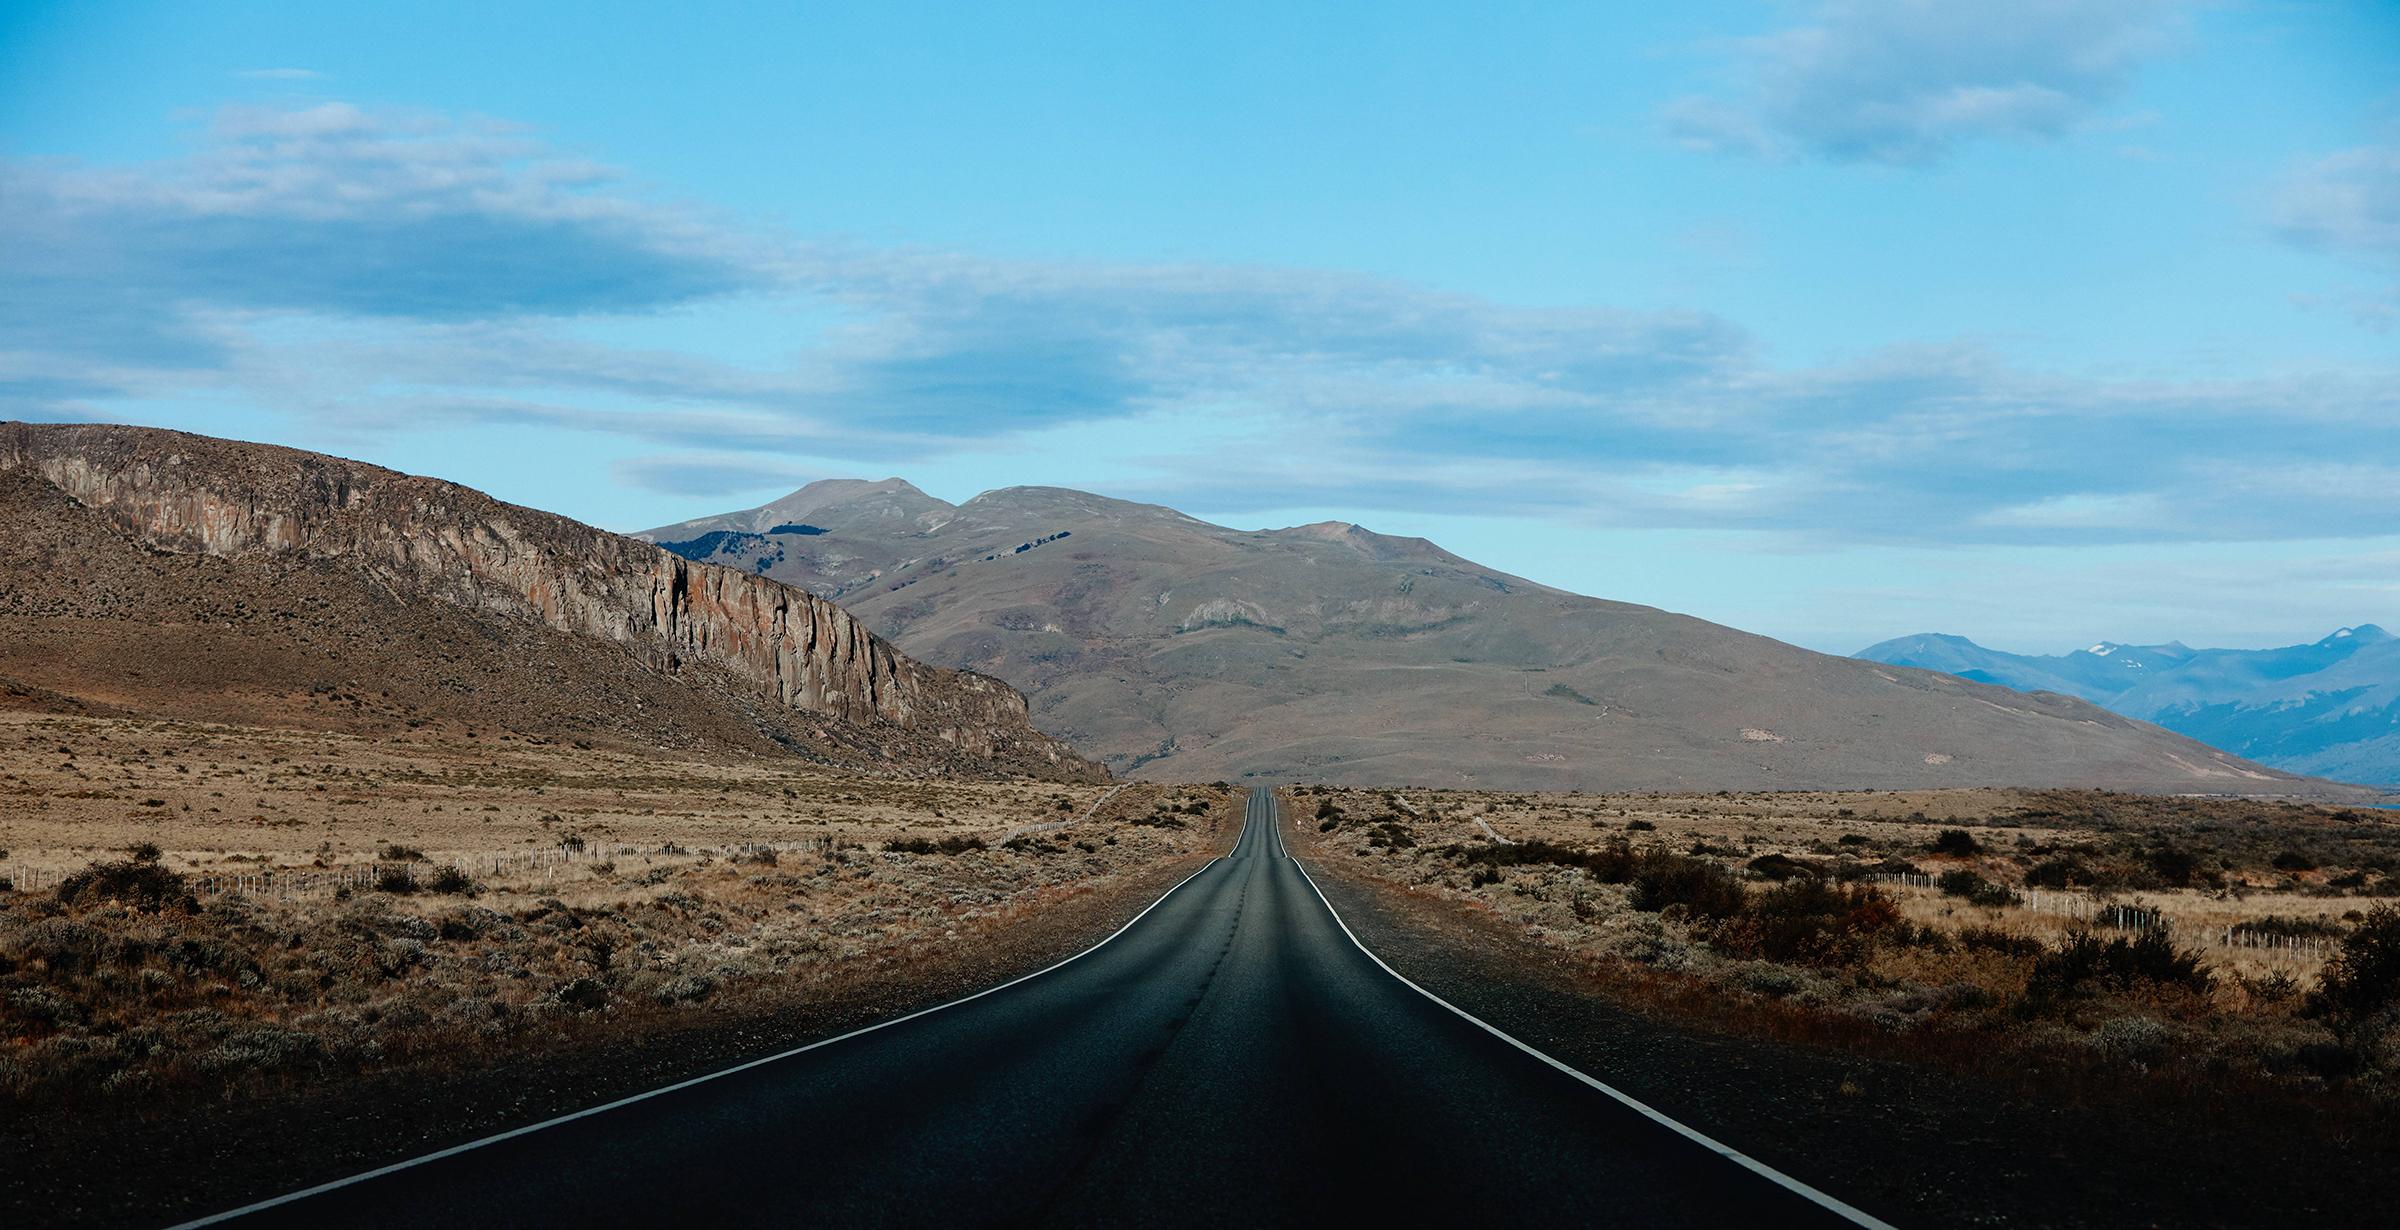 Argentine Patagonia Calafate to El Chaltn